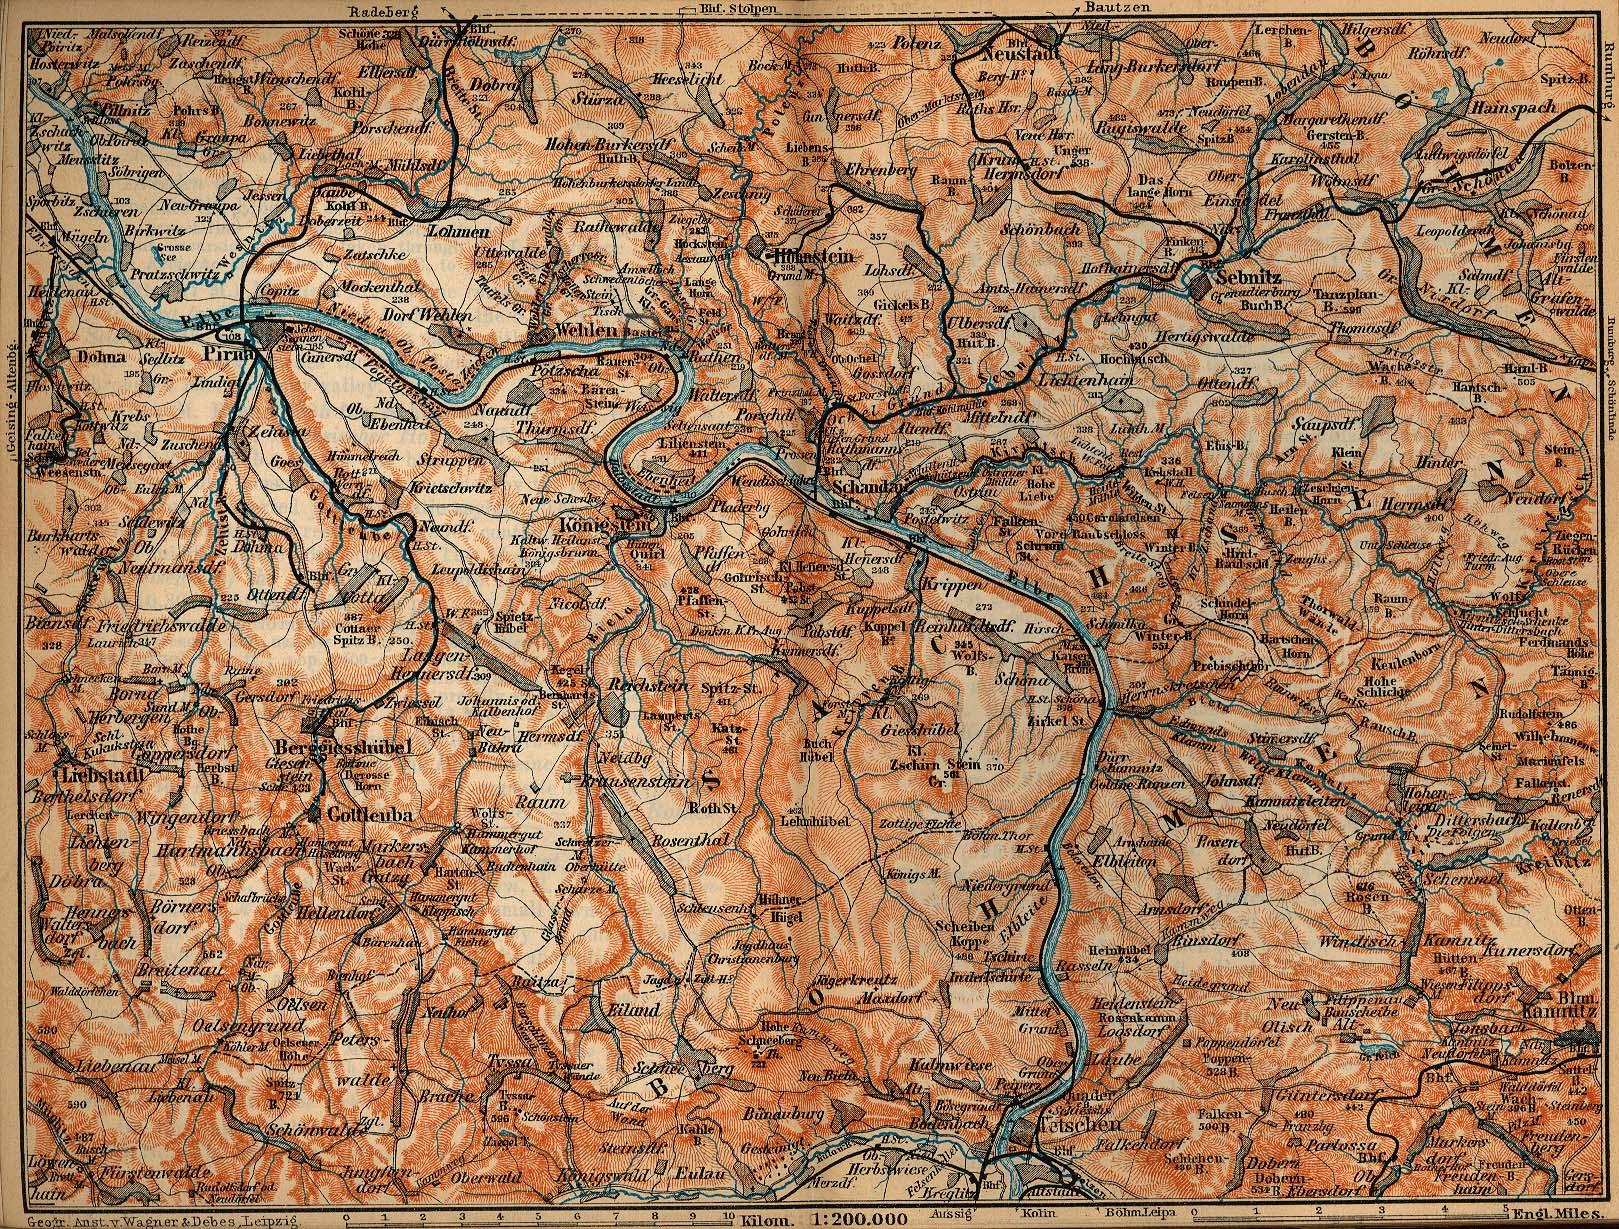 Saxon Switzerland Survey Map, Germany 1910